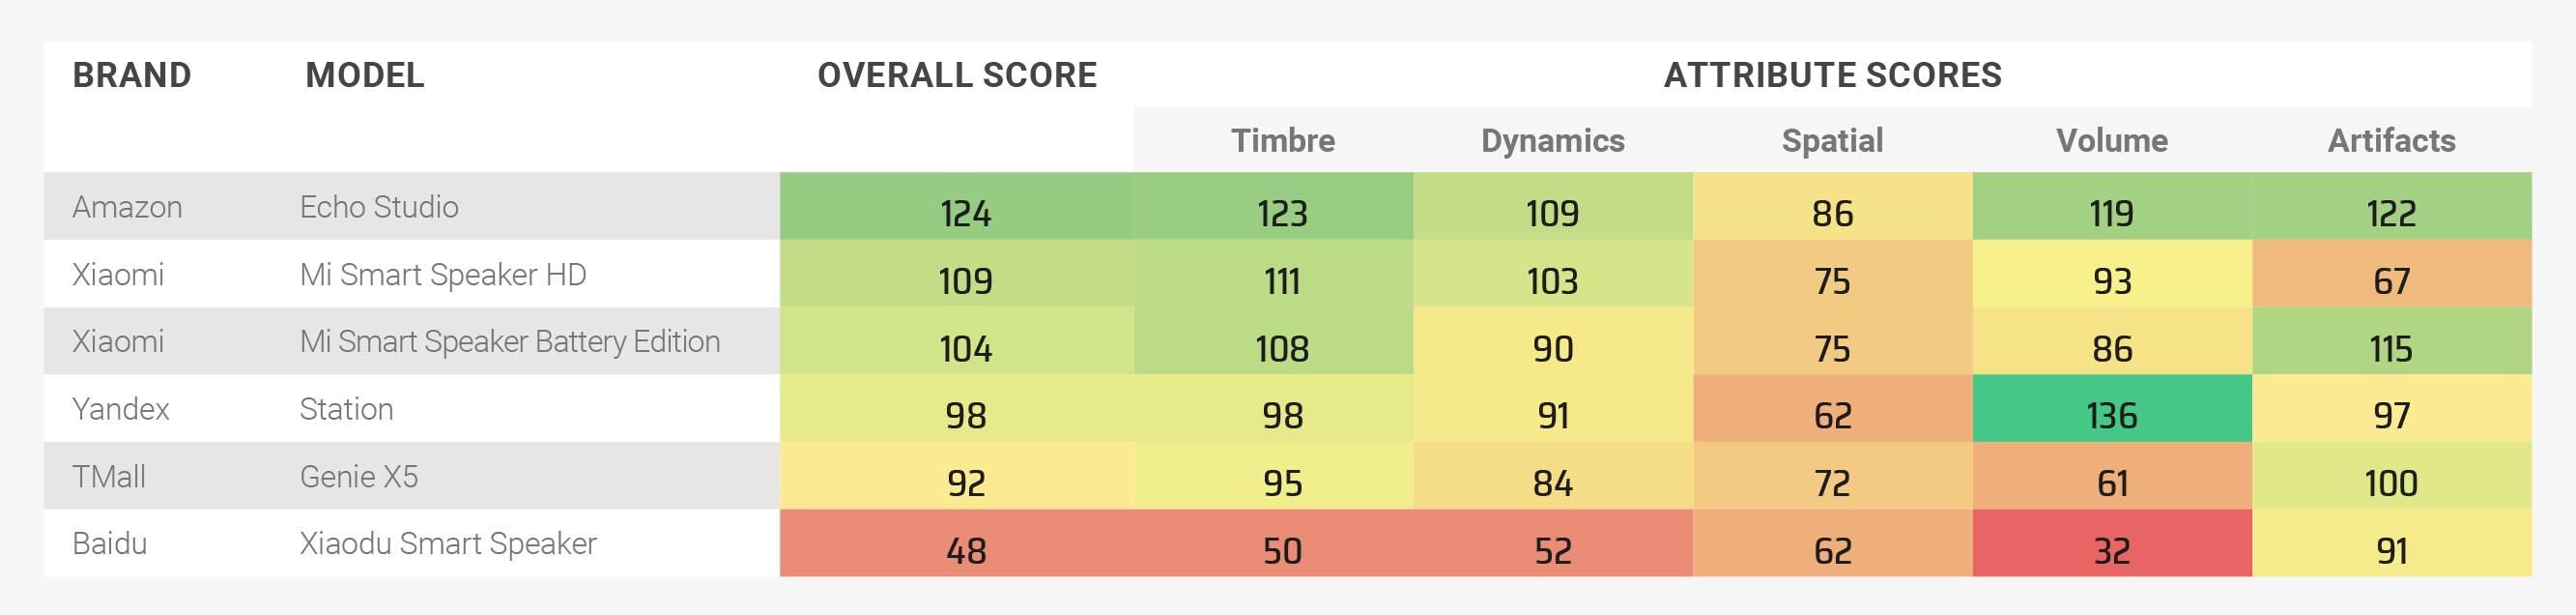 Ranking altavoces DxOMark Xiaomi